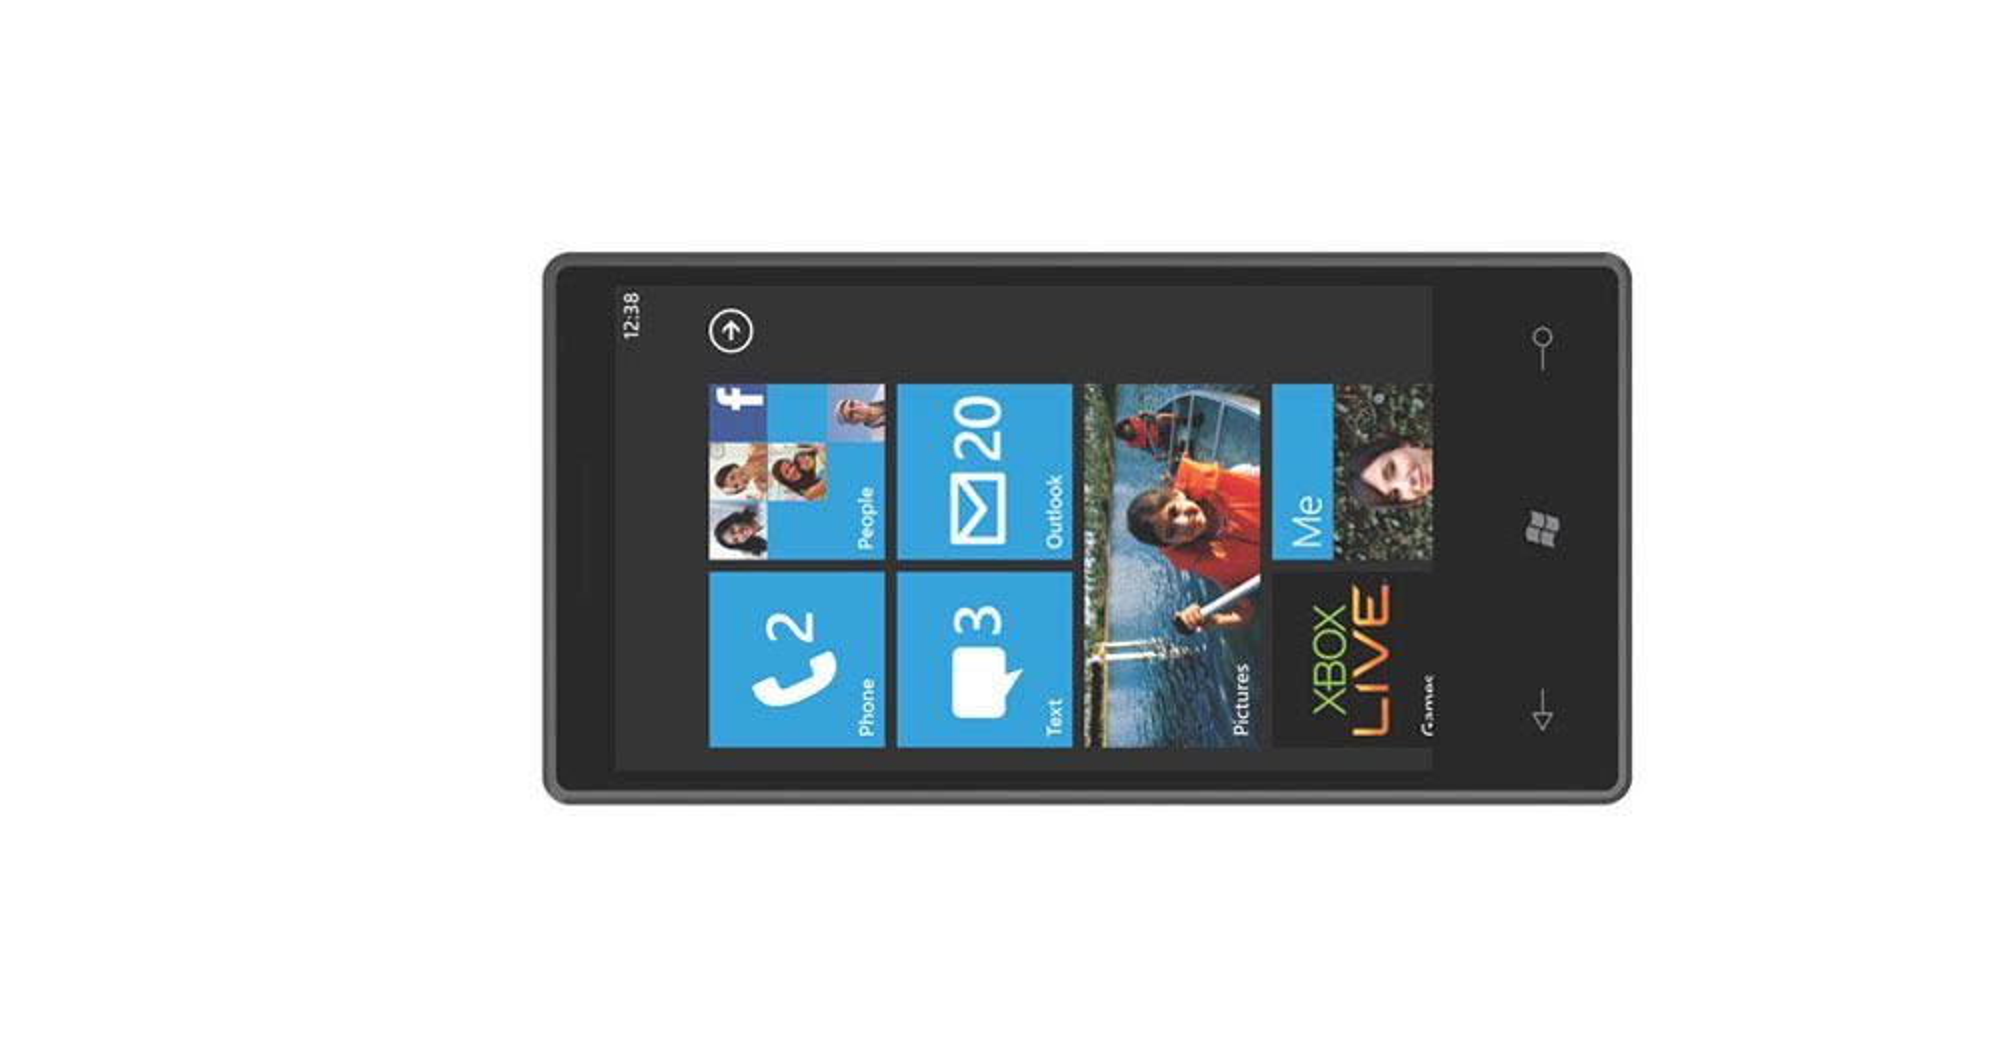 Windows Phone 7.5 i august?